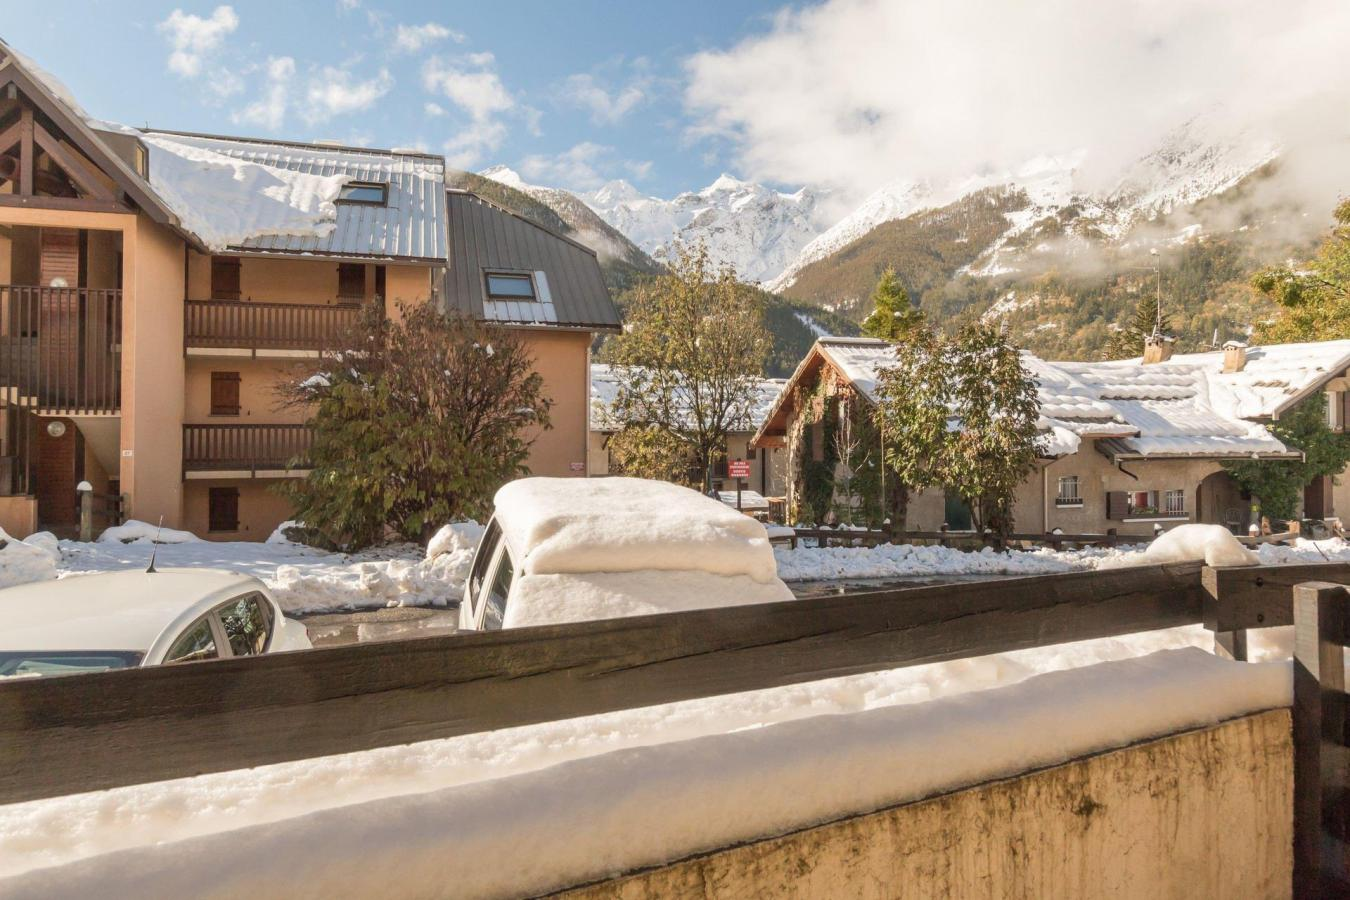 studio 4 personnes 4 serre chevalier alpes du sud residence vie de clare ski planet. Black Bedroom Furniture Sets. Home Design Ideas